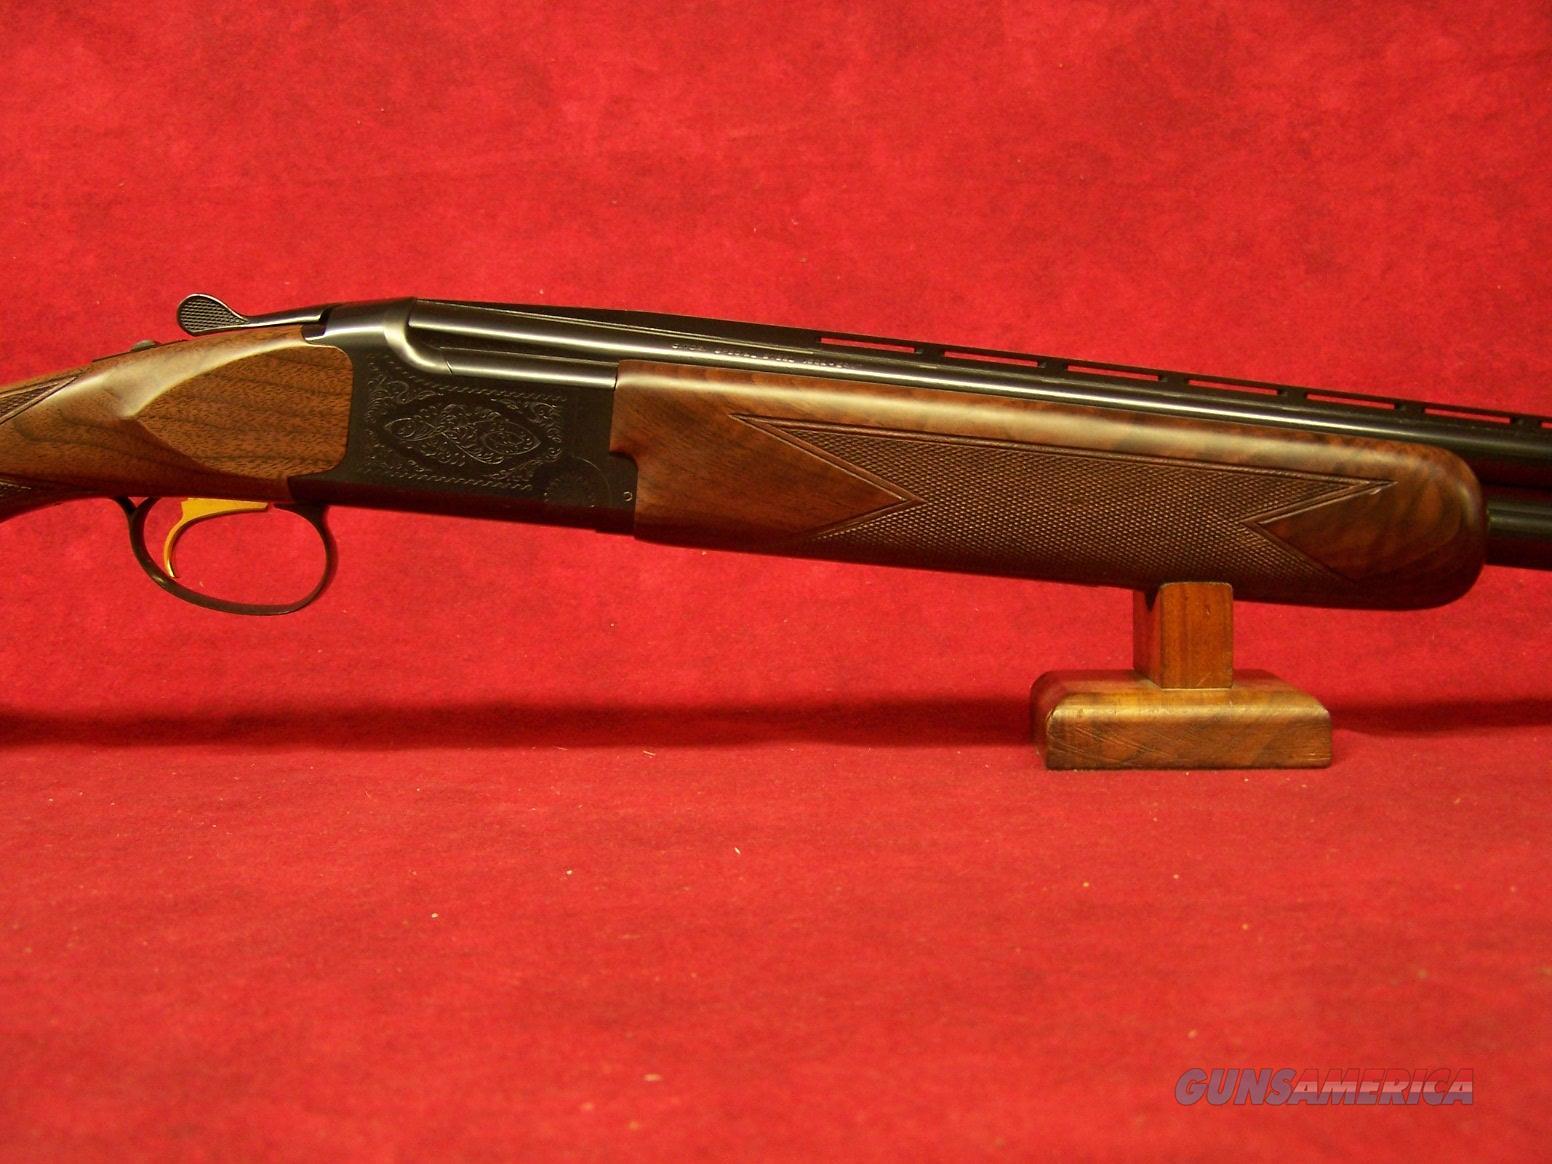 "Browning Citori Gran Lightning 16ga 2.75"" Chamber 26"" Barrel (013493514)  Guns > Shotguns > Browning Shotguns > Over Unders > Citori > Hunting"